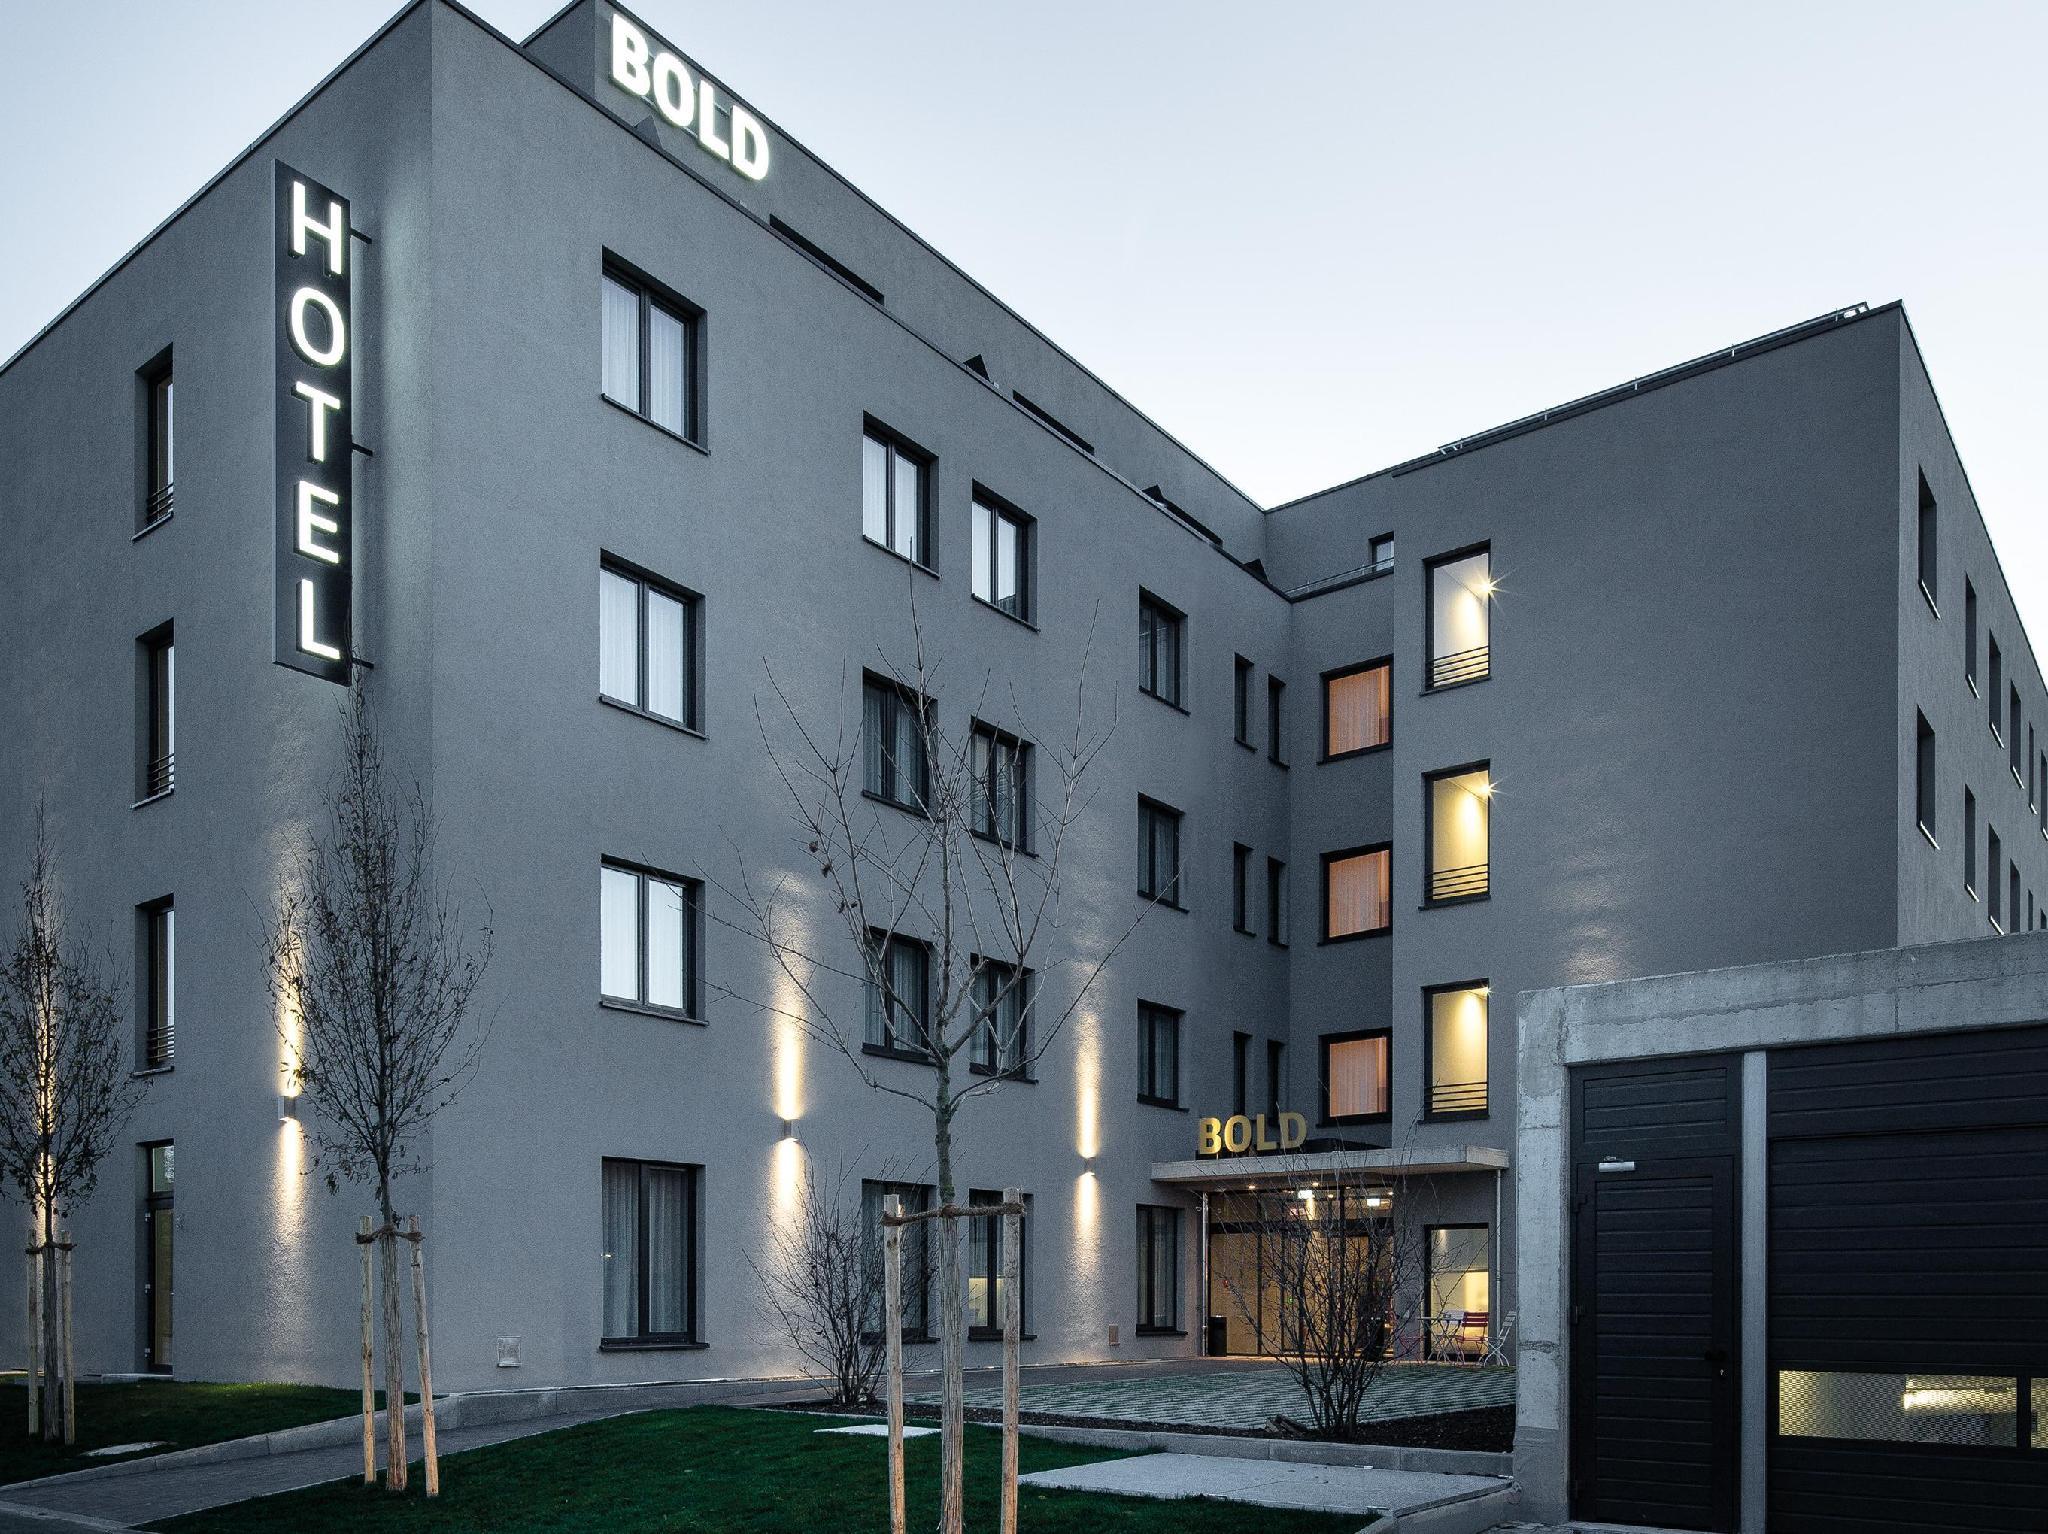 Bold Hotel - Munich